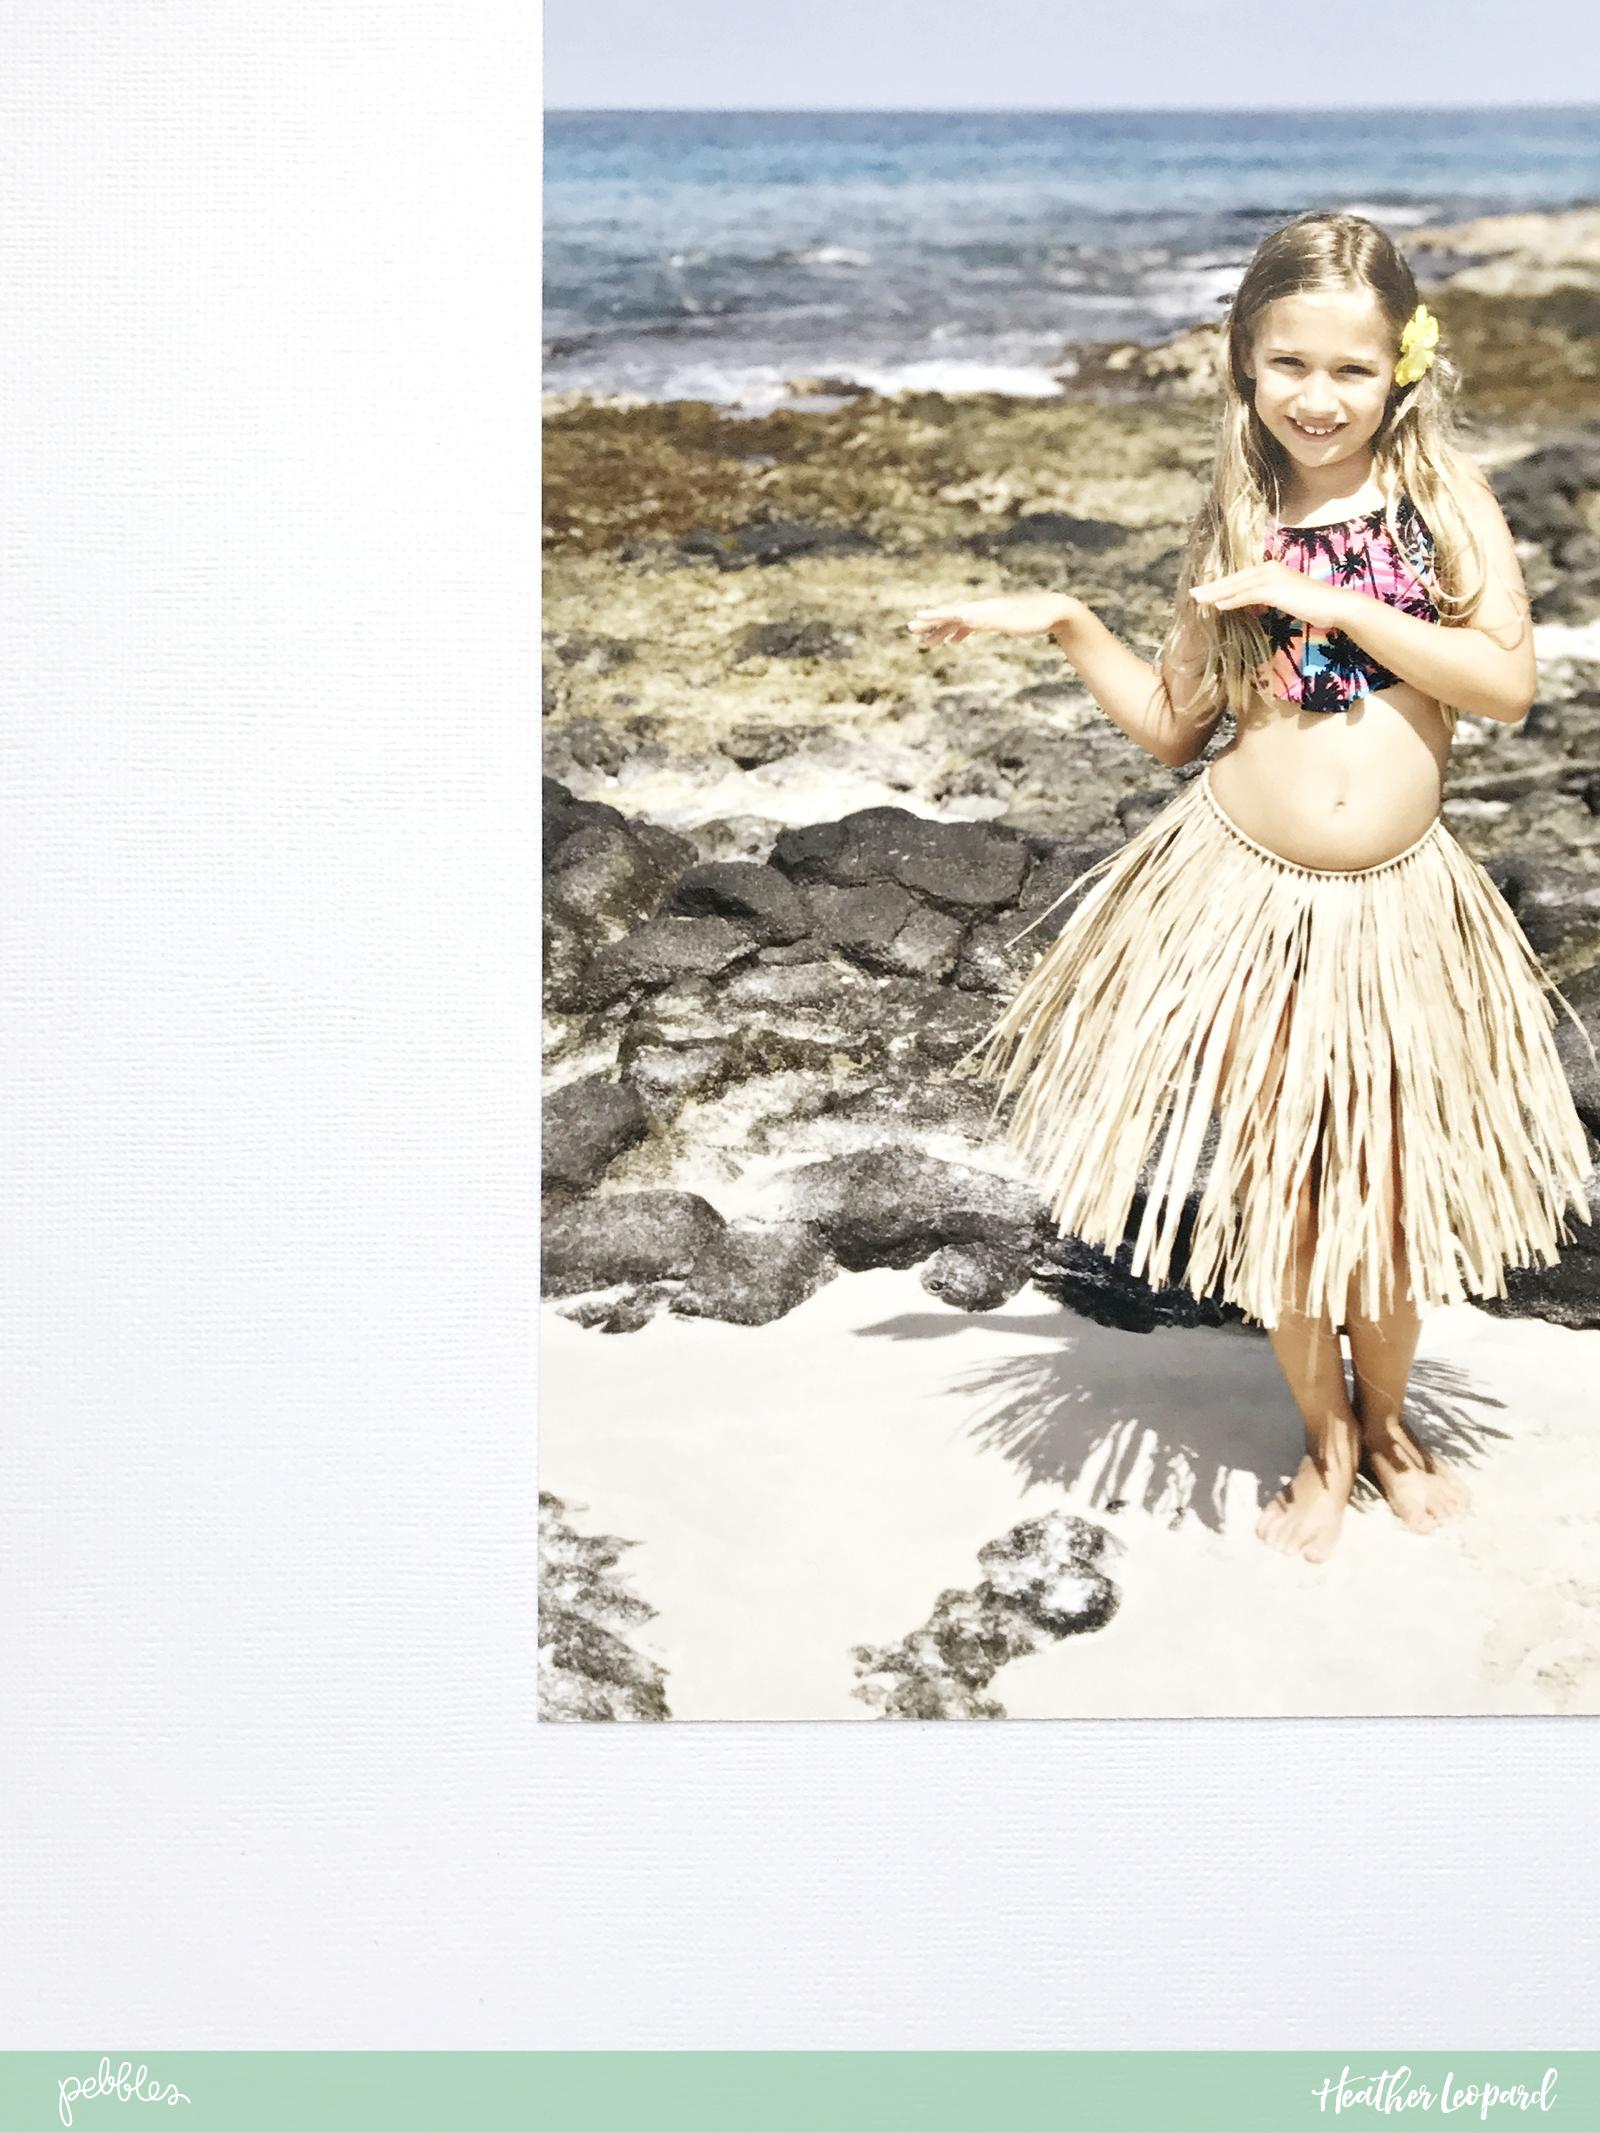 Aloha heart and free cut file by Heather Leopard using @PebblesInc #SunshinyDays collection #scrapbook #summer #scrapbooking #hula #madewithpebbles #aloha #hawaii